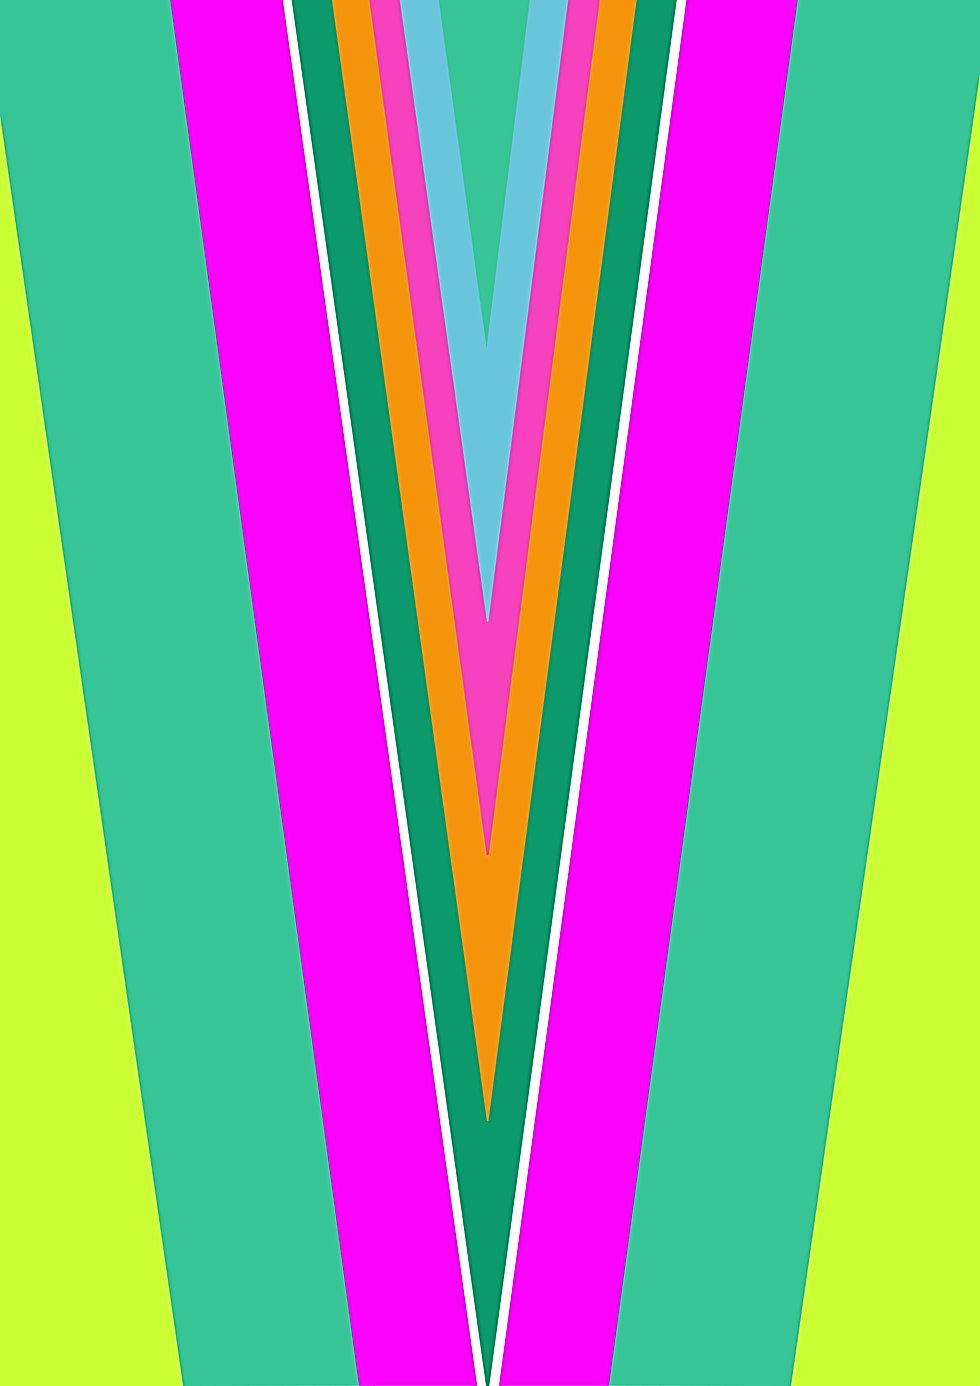 background 90ies 2.jpg